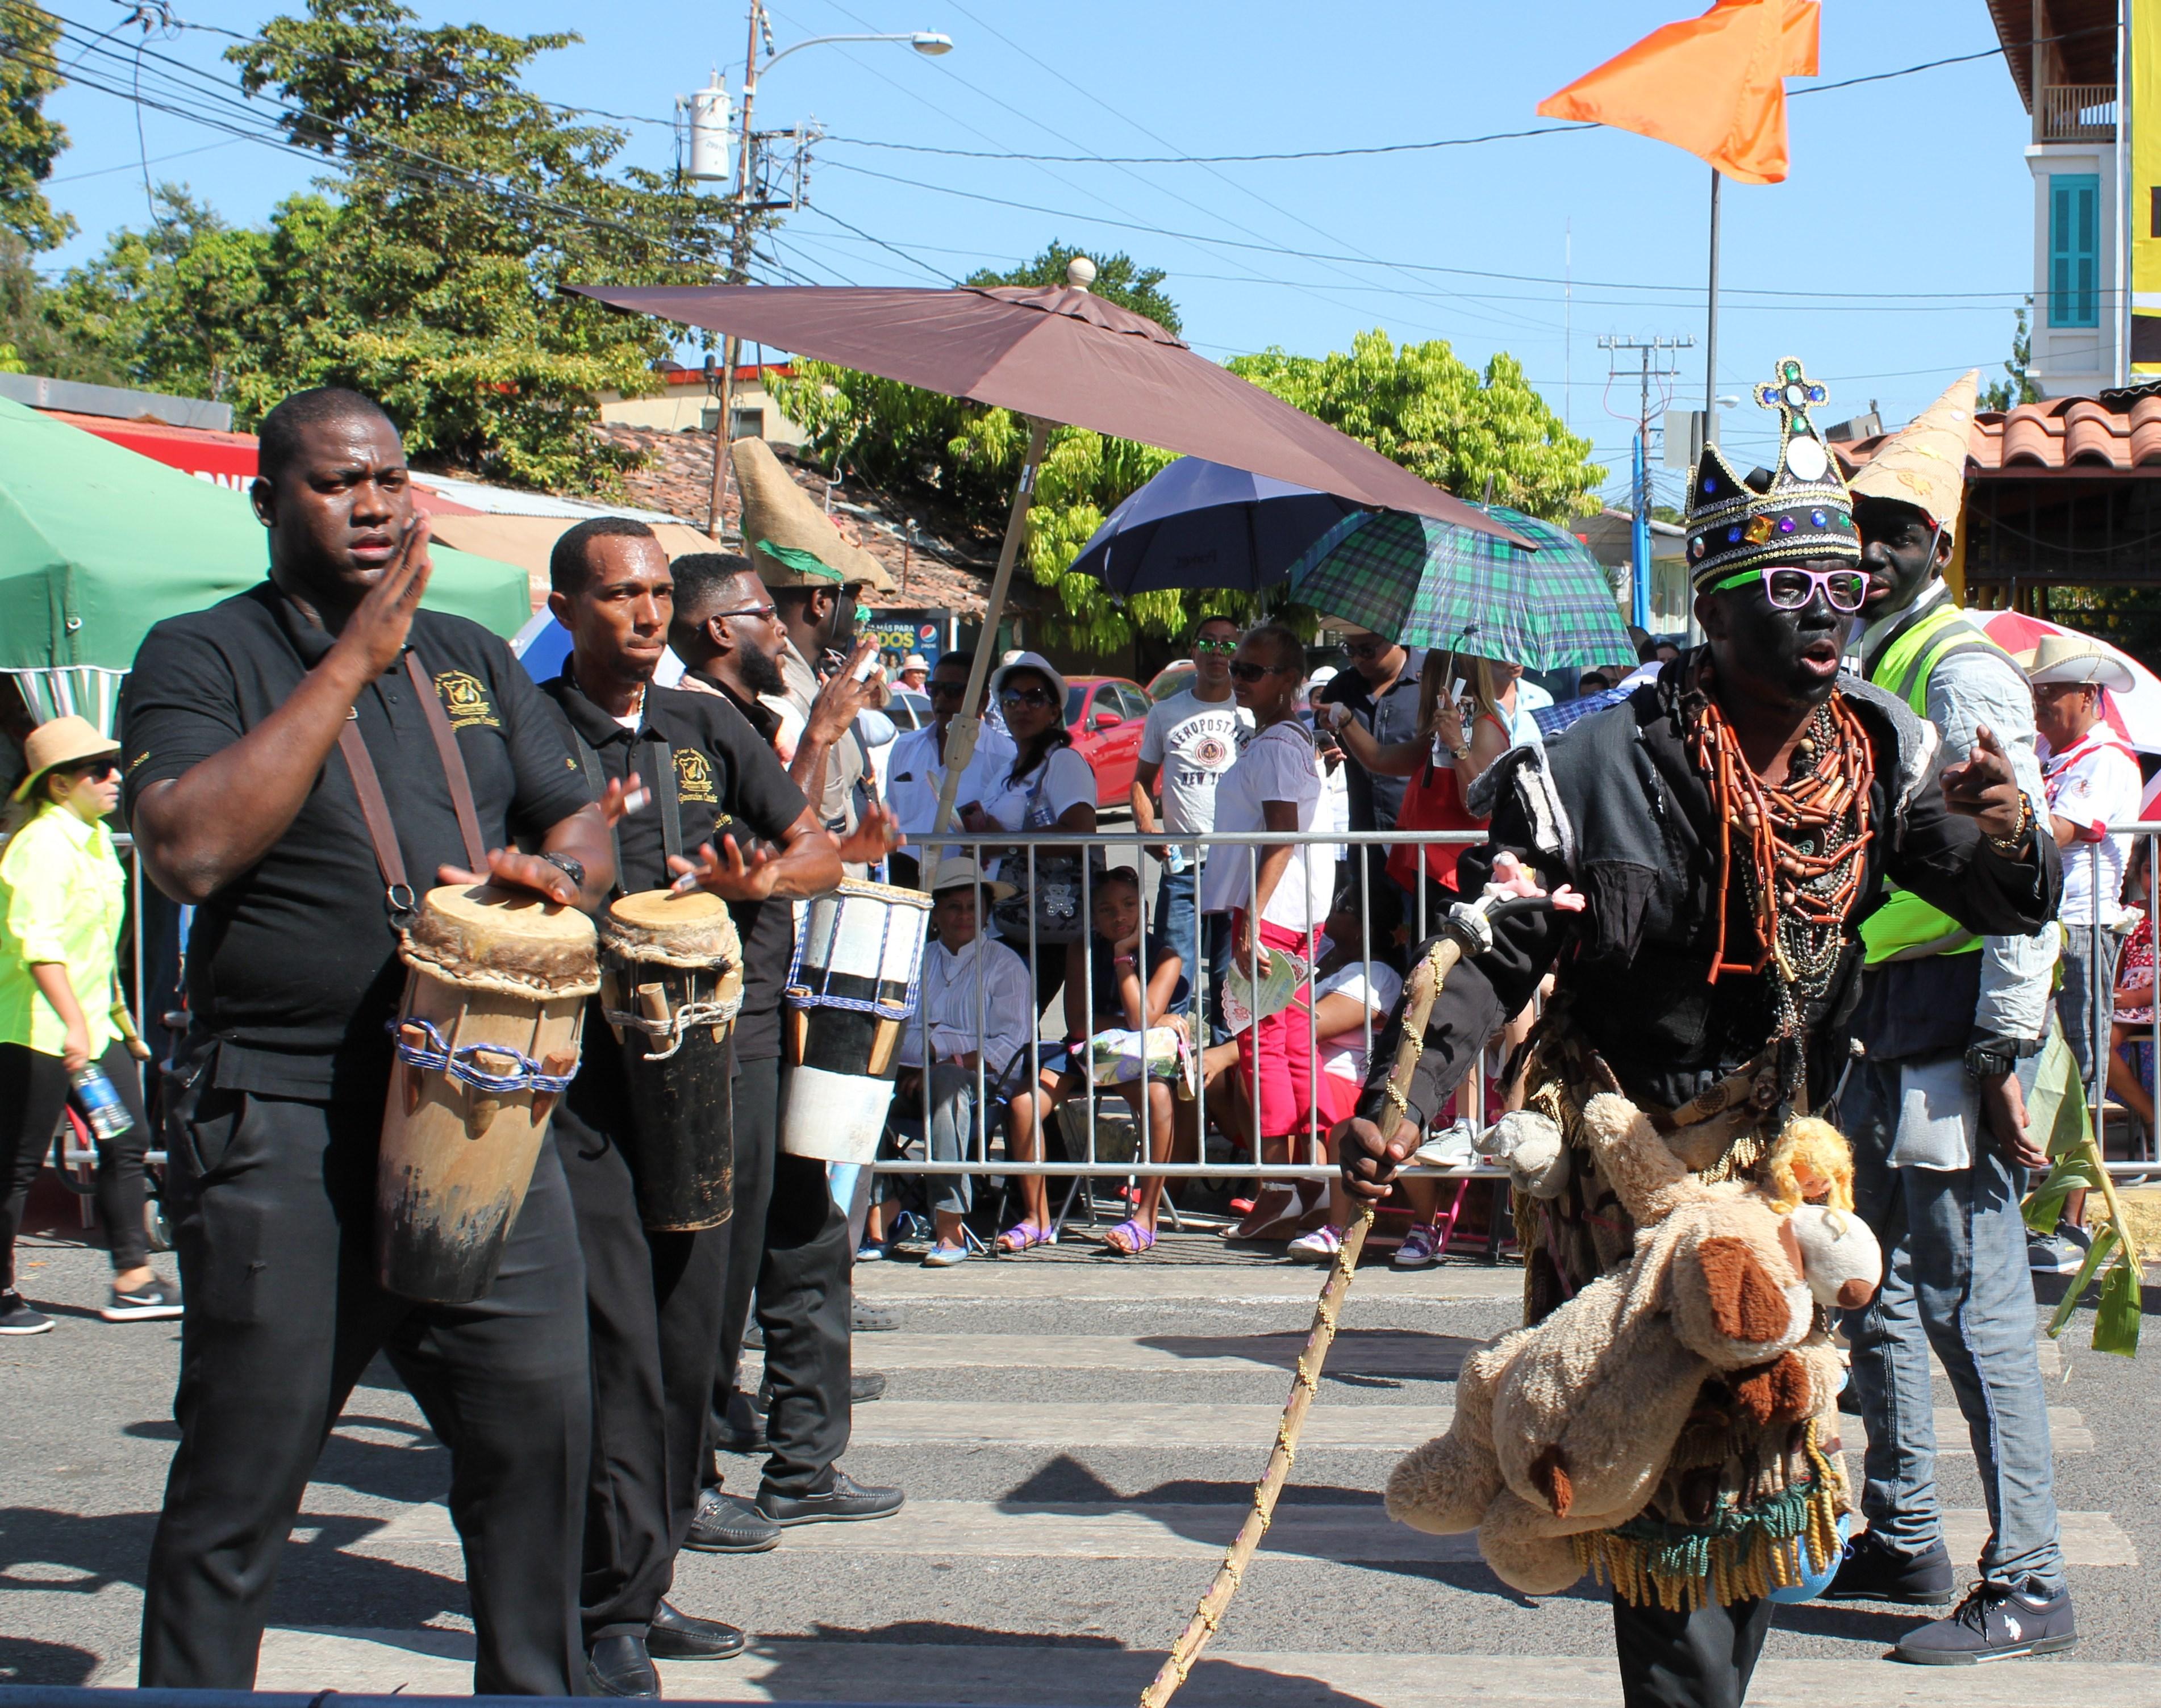 carrib-pollera-parade A Panama Road Trip Panama Panama Fairs and Festivals